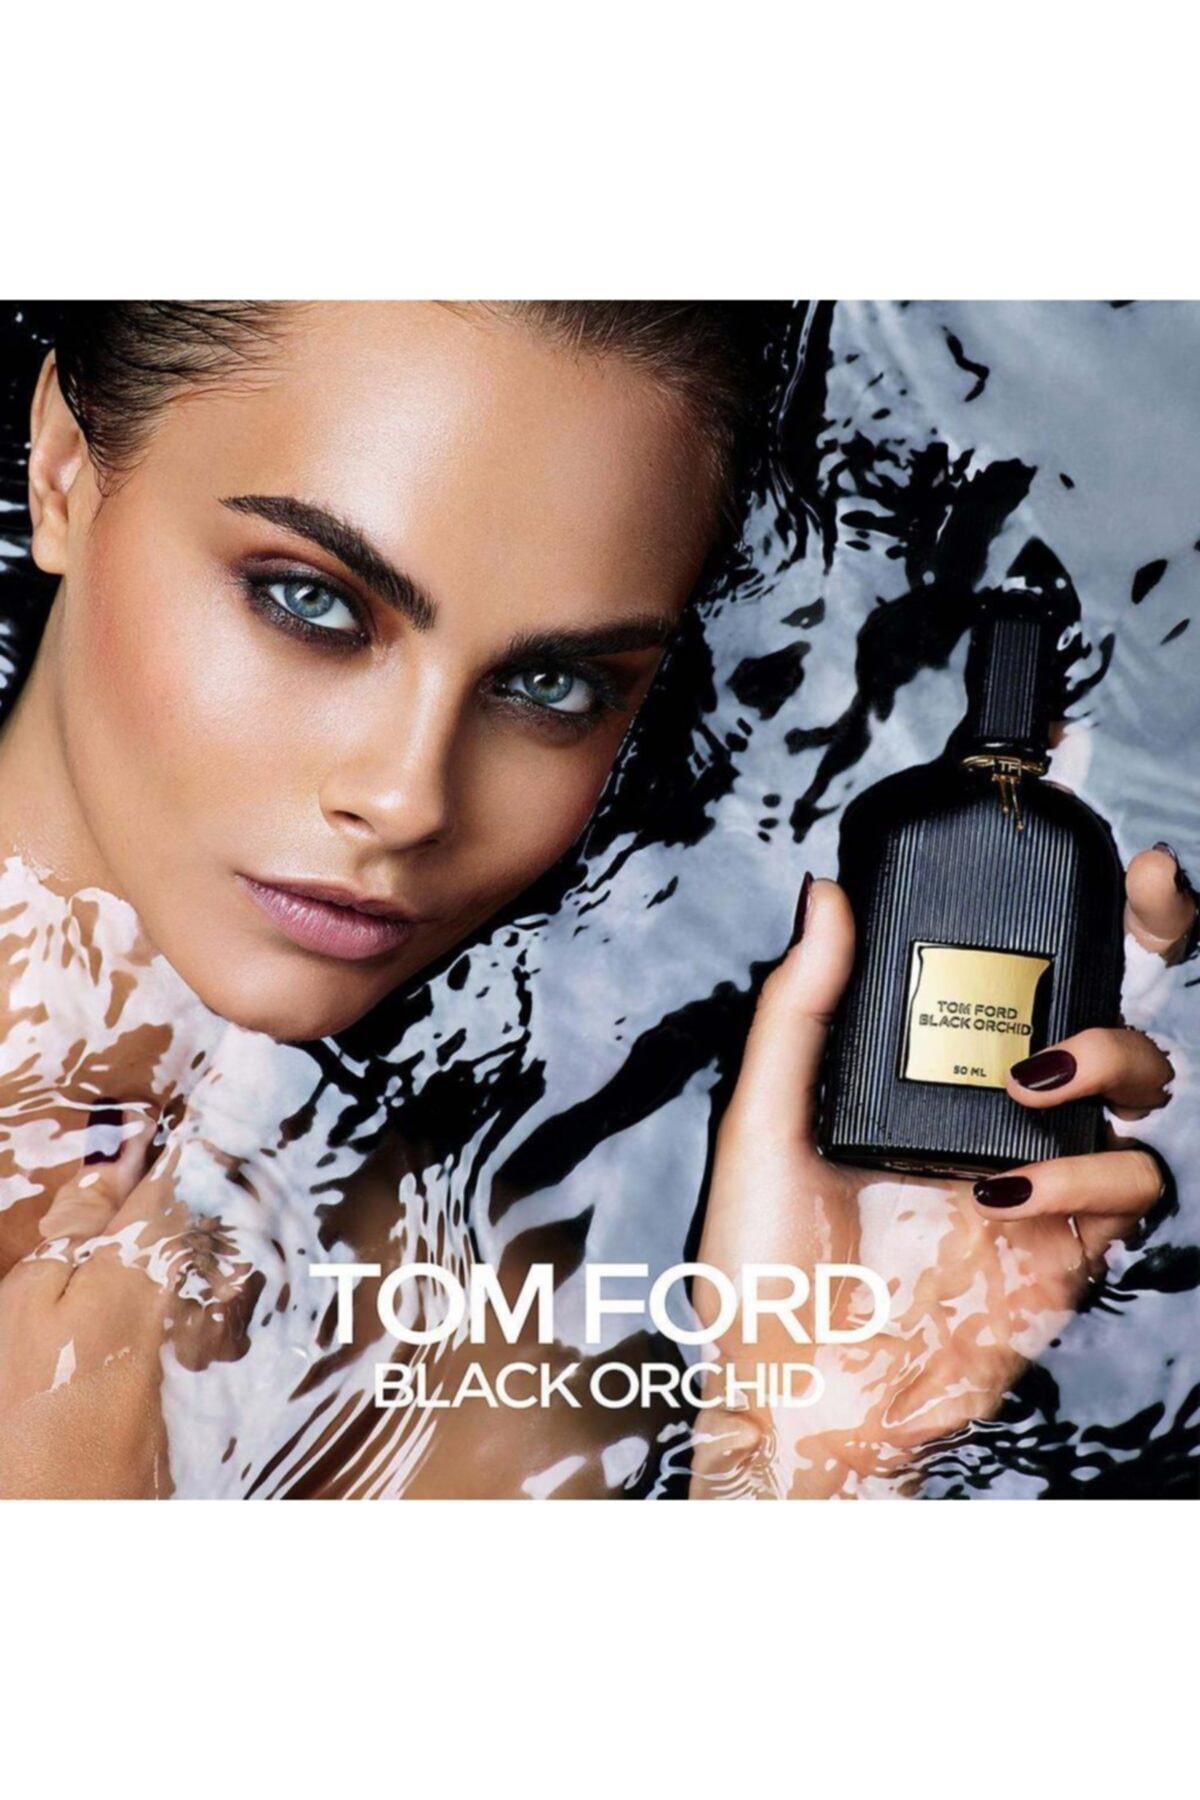 Tom Ford Black Orchid Edp 100 ml 2